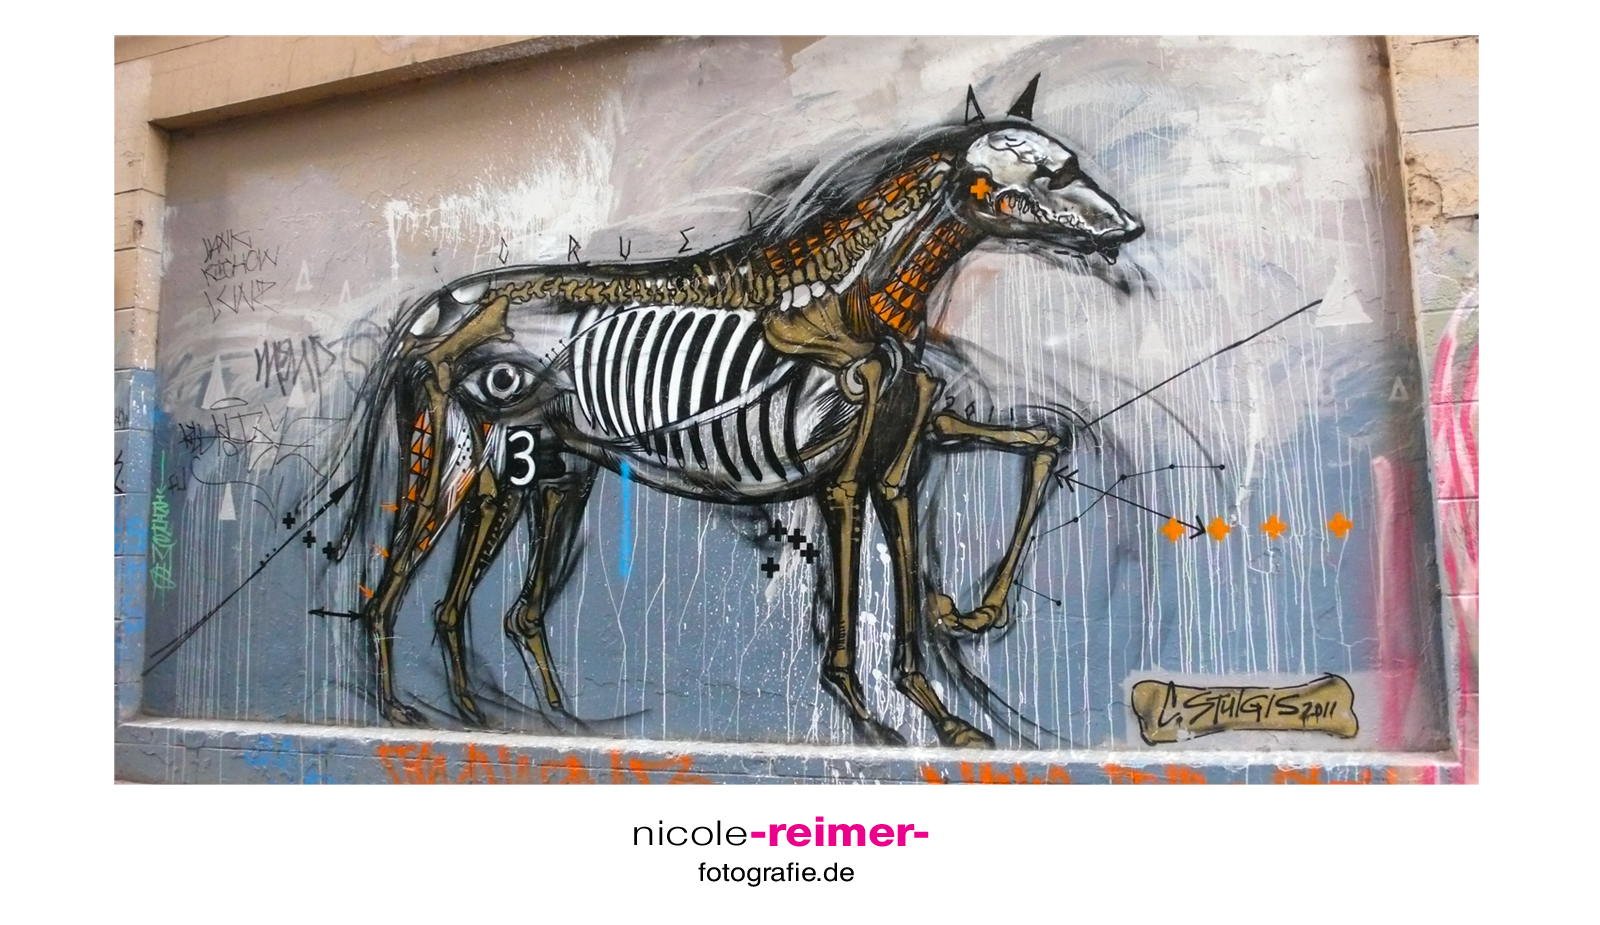 Nicole_Reimer_Fotografie_Street_Art_Melbourne_5